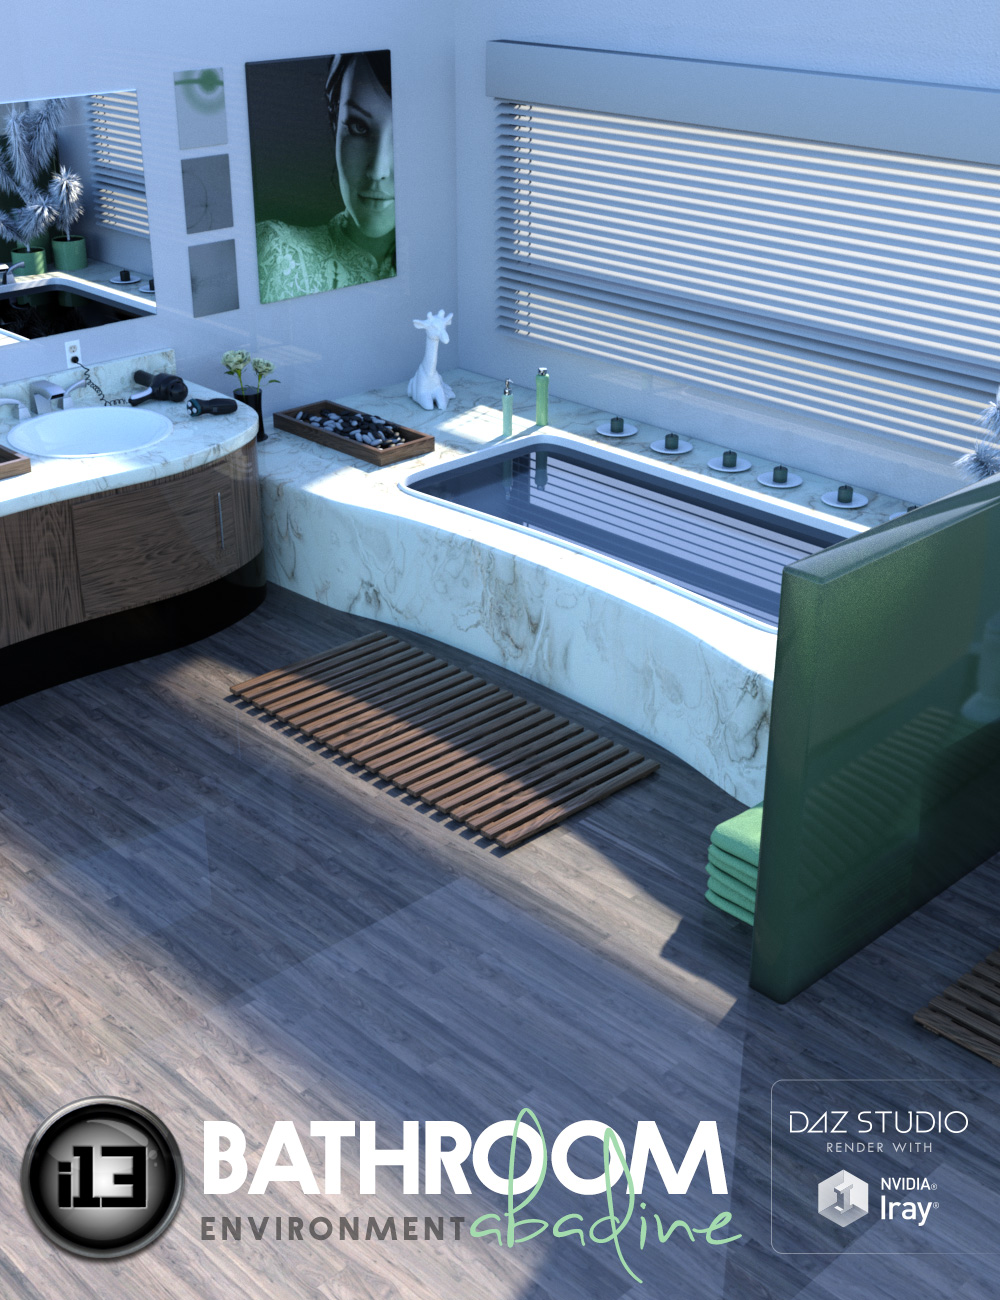 i13 Bathroom Abadine by: ironman13, 3D Models by Daz 3D